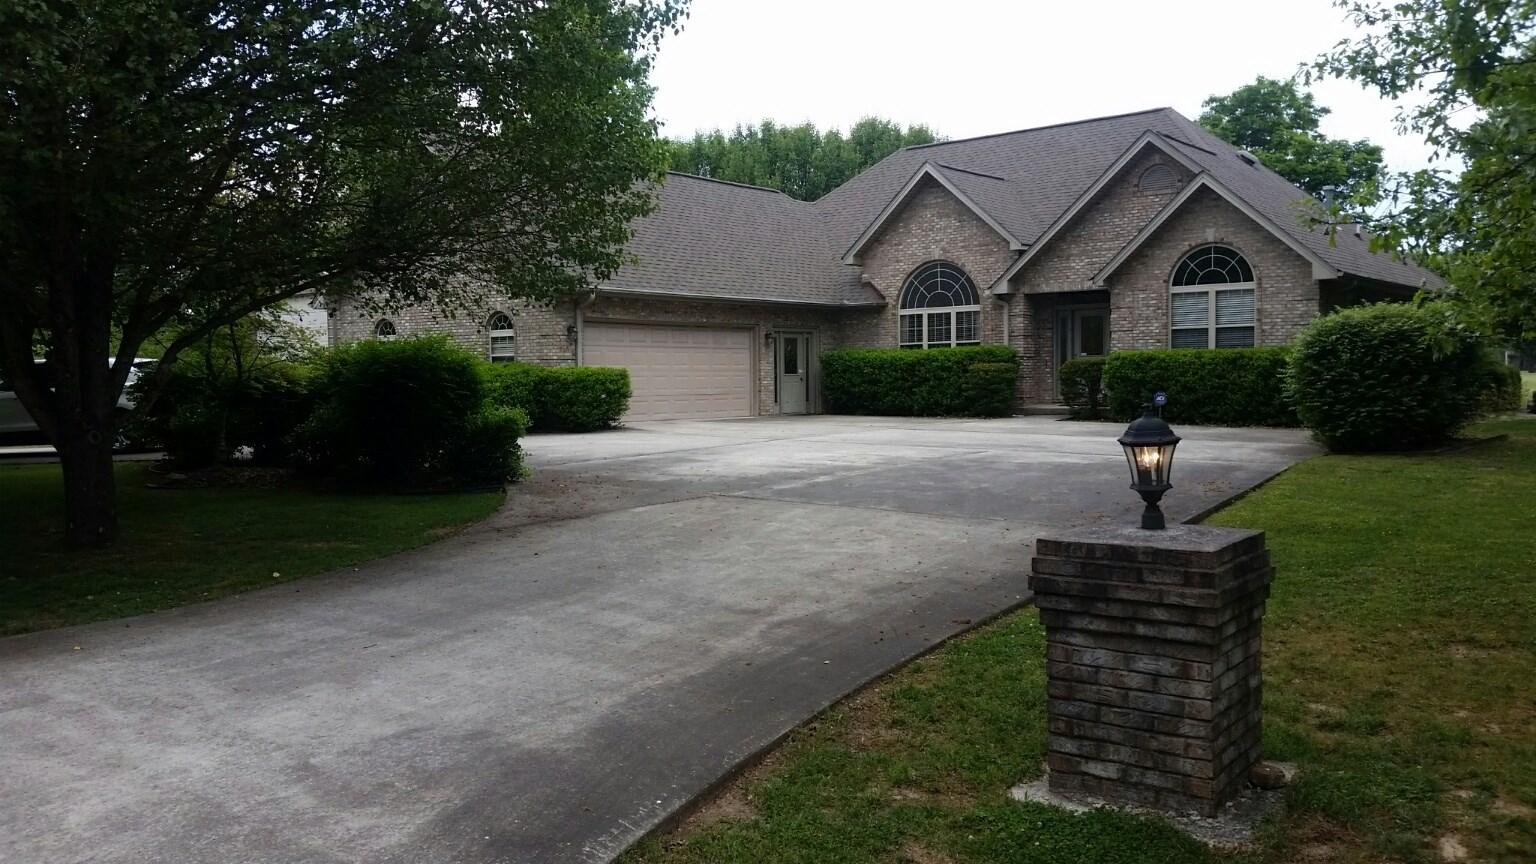 Brick Home for sale 1112 Arrowhead Dr, Crossville TN 38572